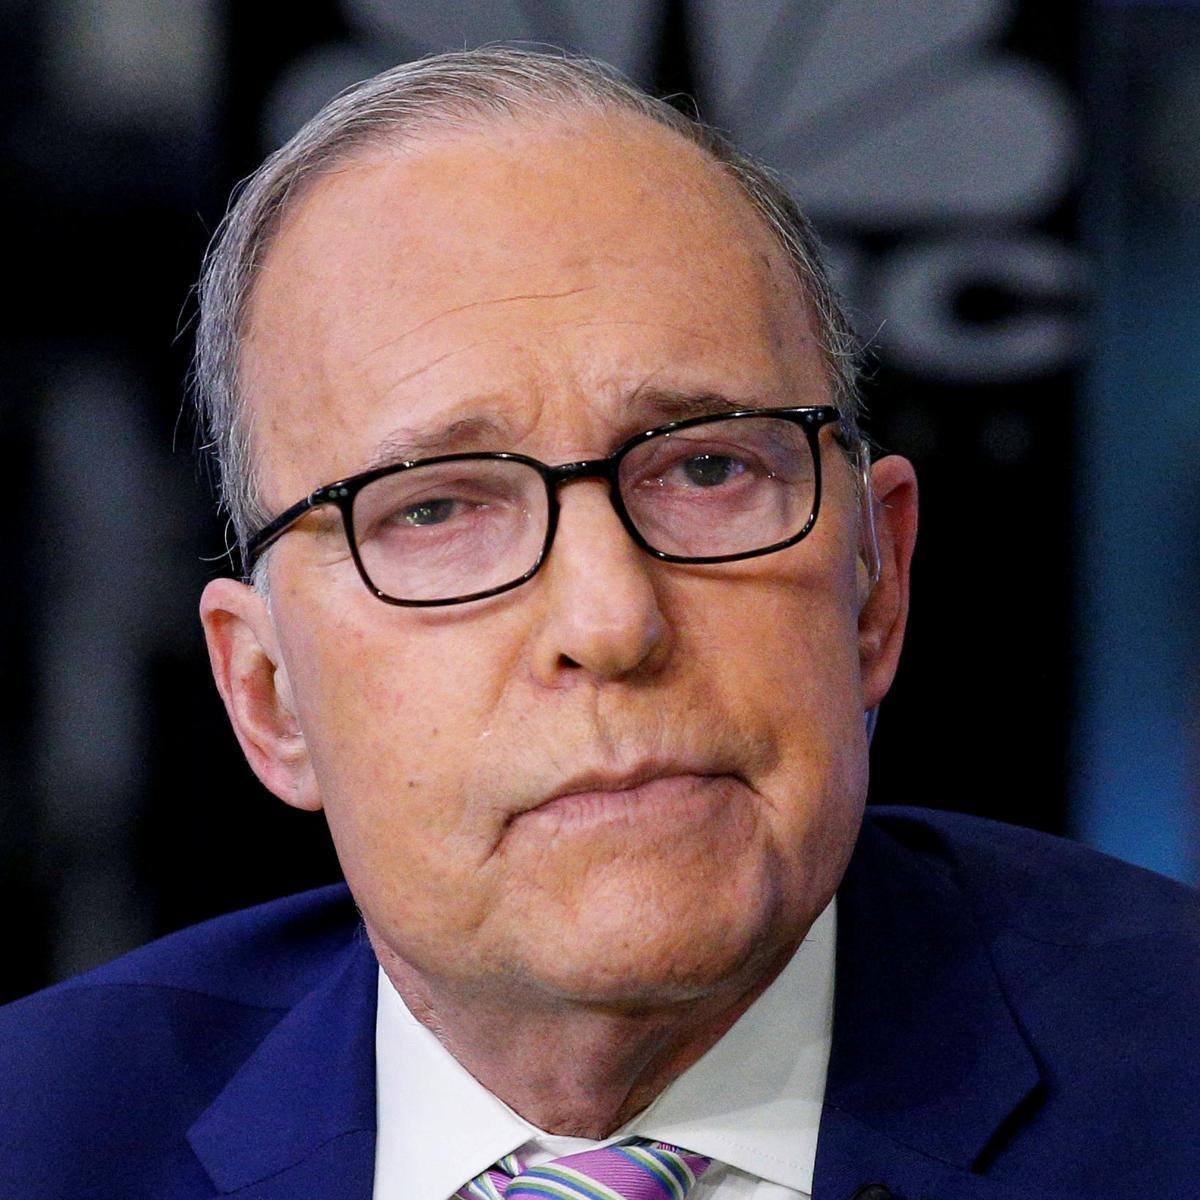 Trump Taxes Hurt: Trump Adviser: Trade Moves Not Intended To Hurt U.S